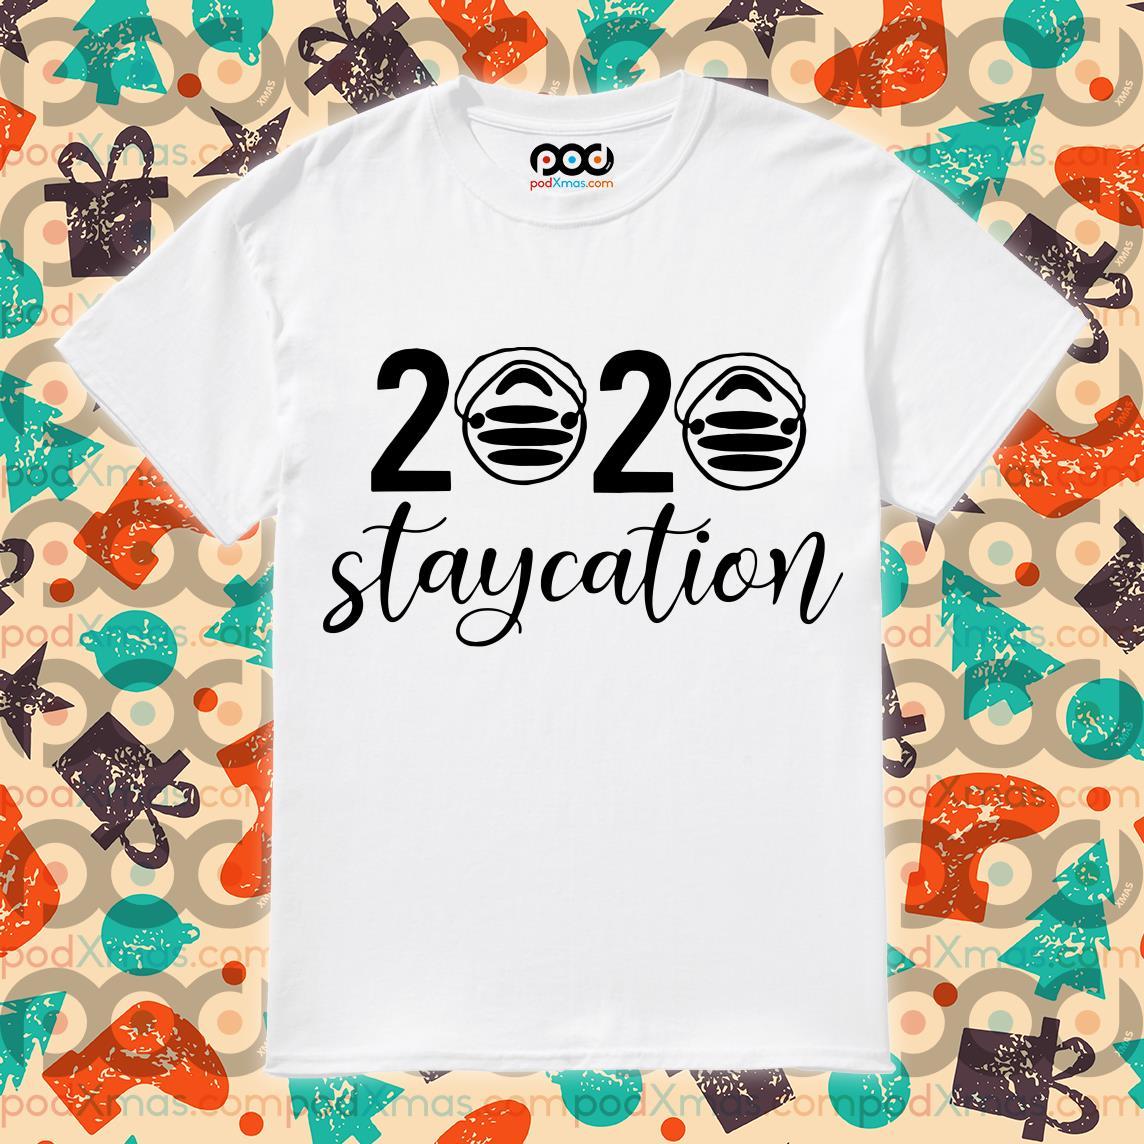 2020 staycation quarantine T-shirt